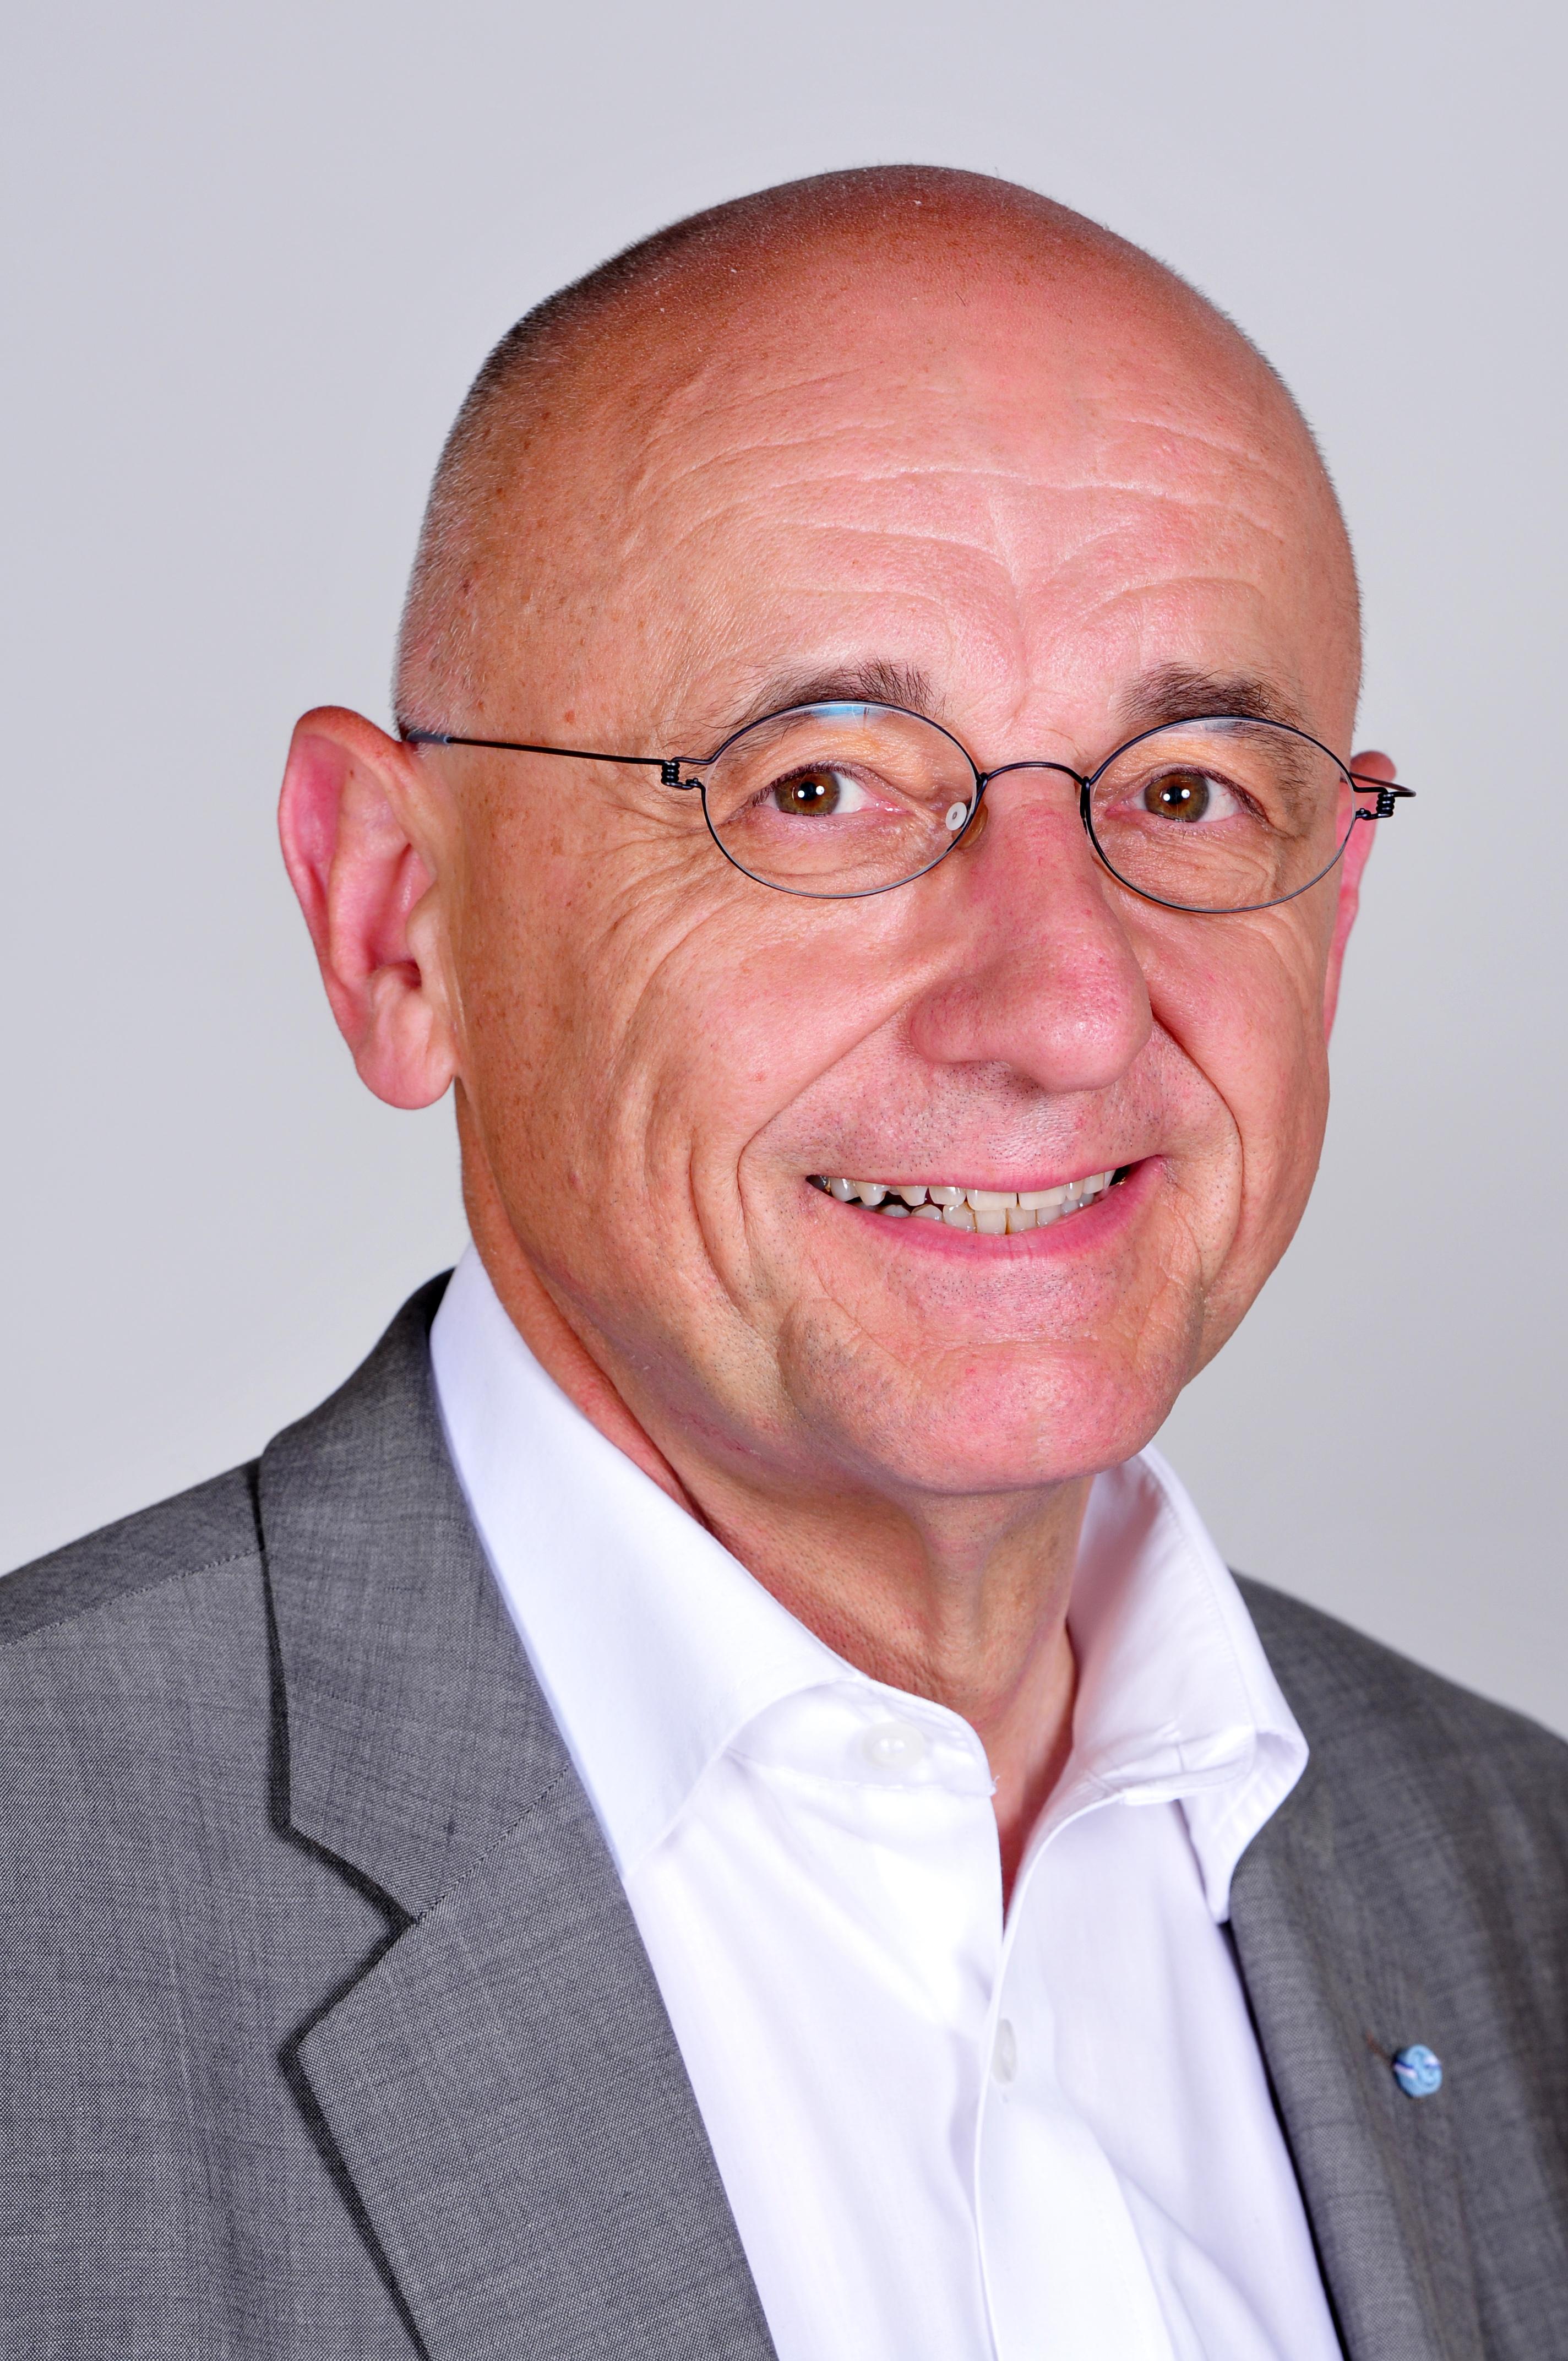 File:Alfred Sauter 2012 - RalfR.jpg - Wikimedia Commons